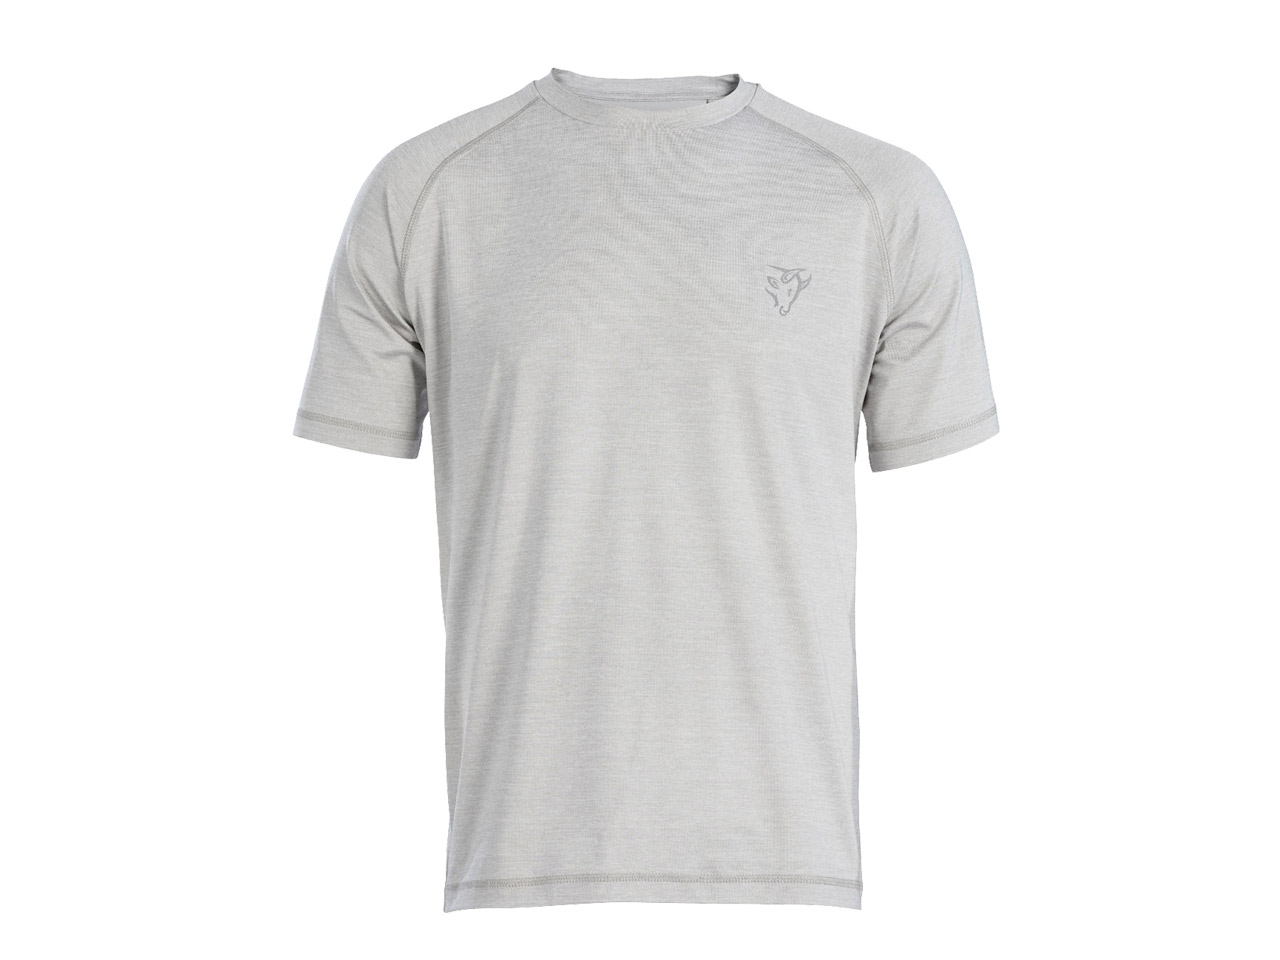 bf641676 Shirts